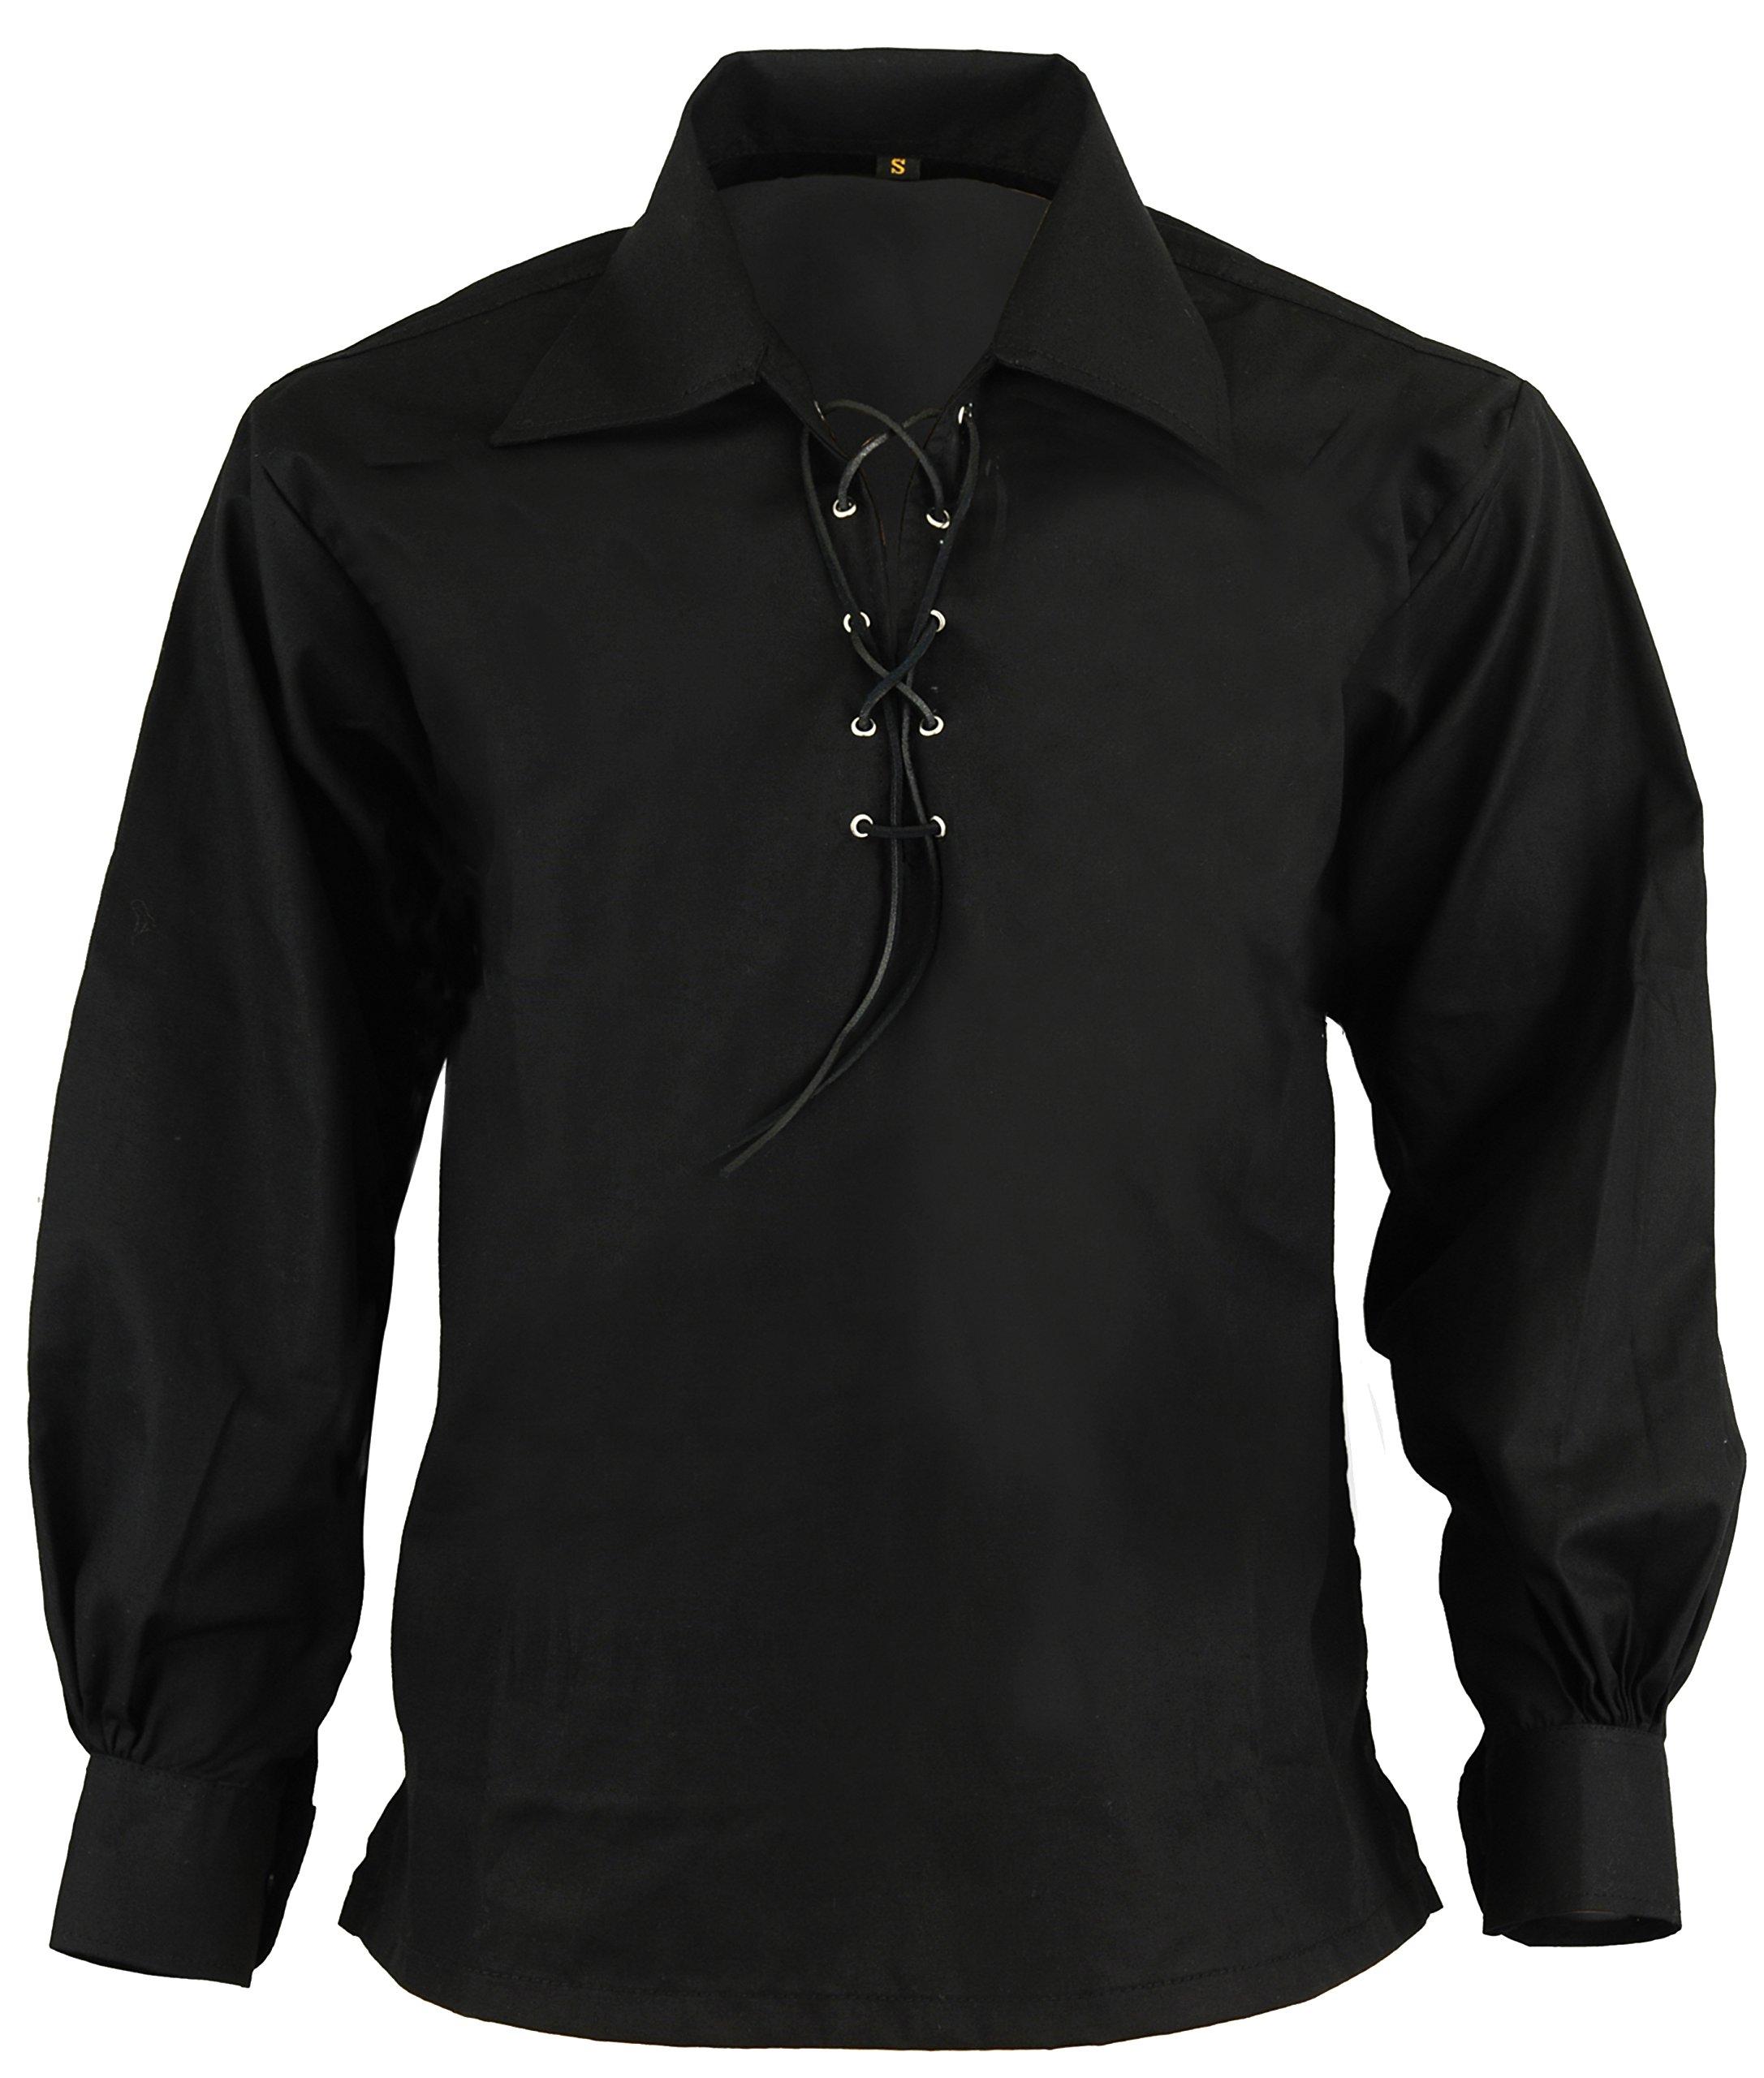 Hamilton Kilts Black Scottish Highland Jacobite Jacobean Ghillie Kilt Shirt, XXL